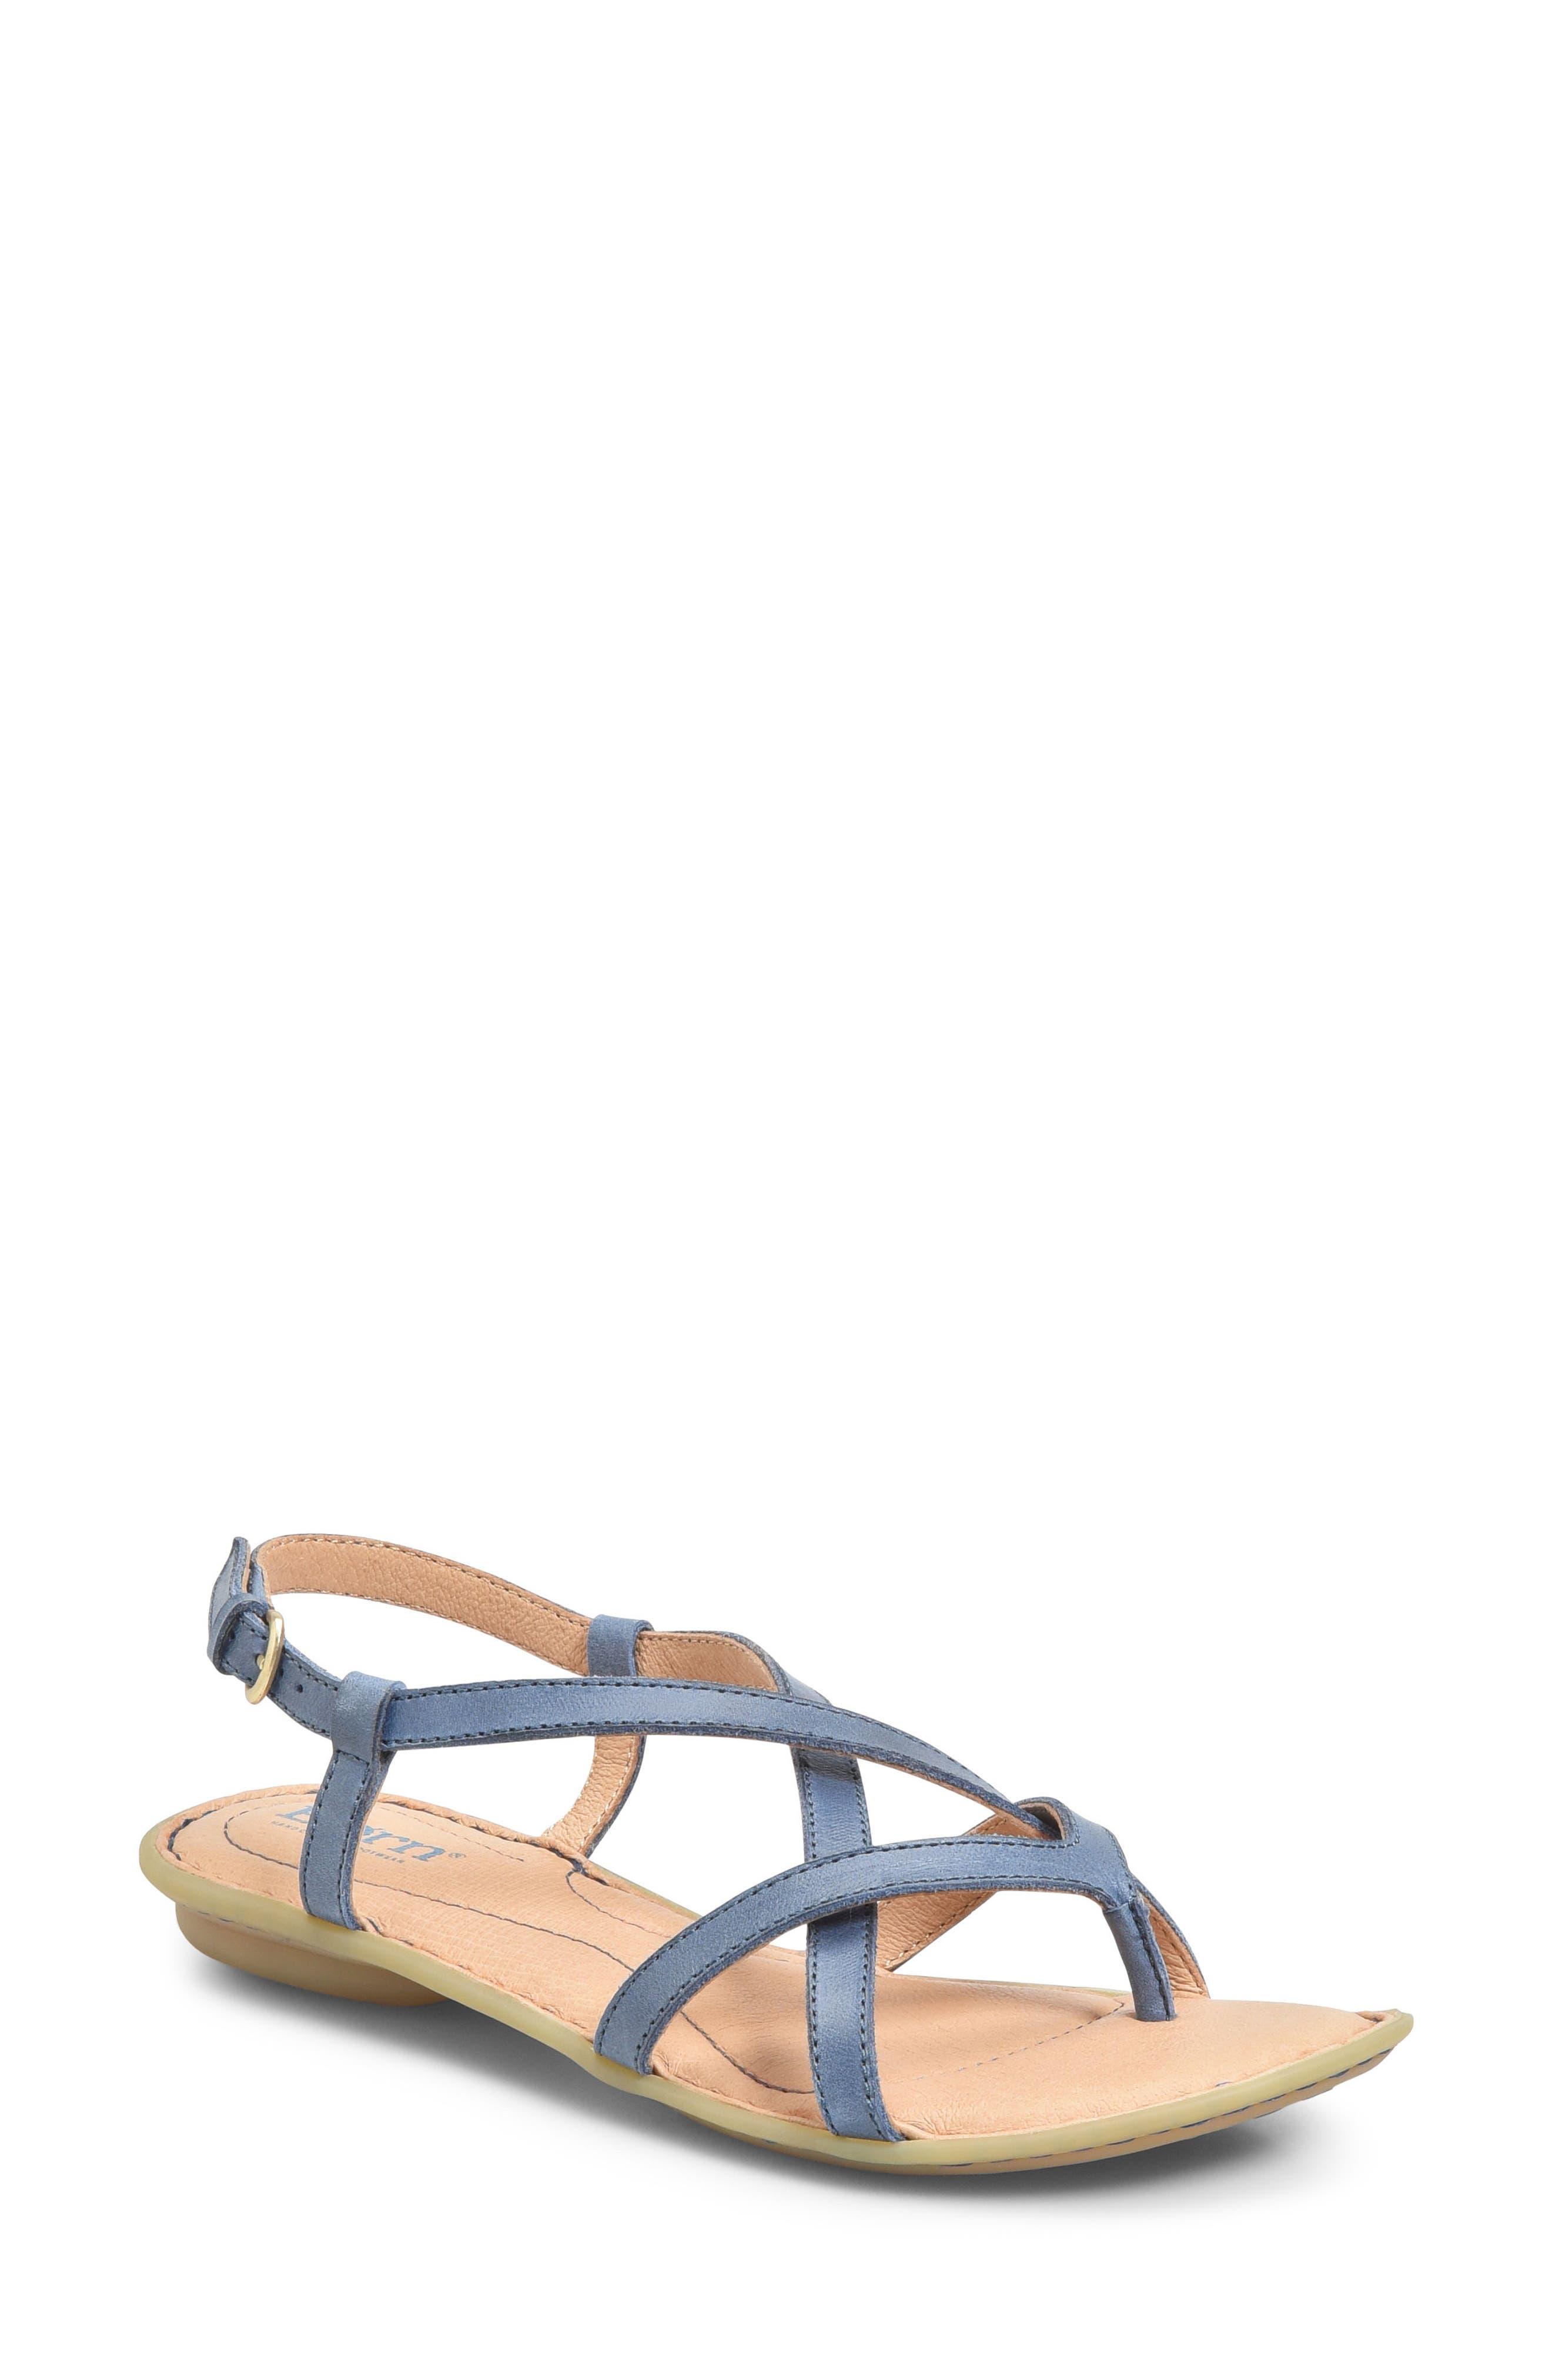 Mai Strap Sandal,                             Main thumbnail 1, color,                             Navy Leather